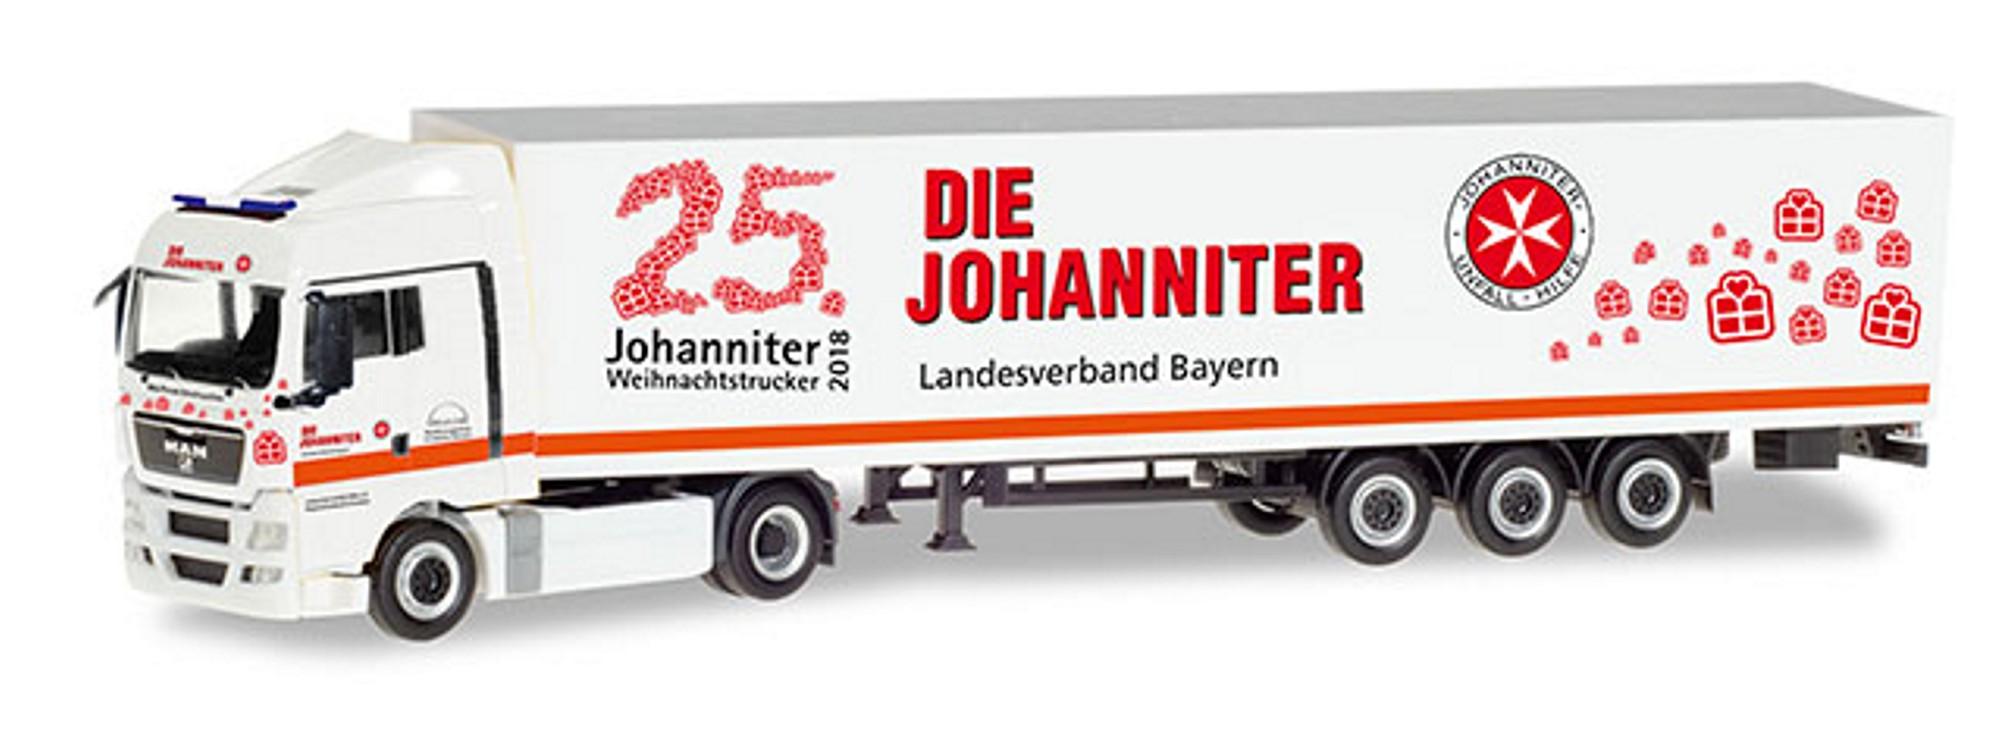 Herpa 309851 Man Tgx Xlx Koffersattelzug Johanniter Bayern